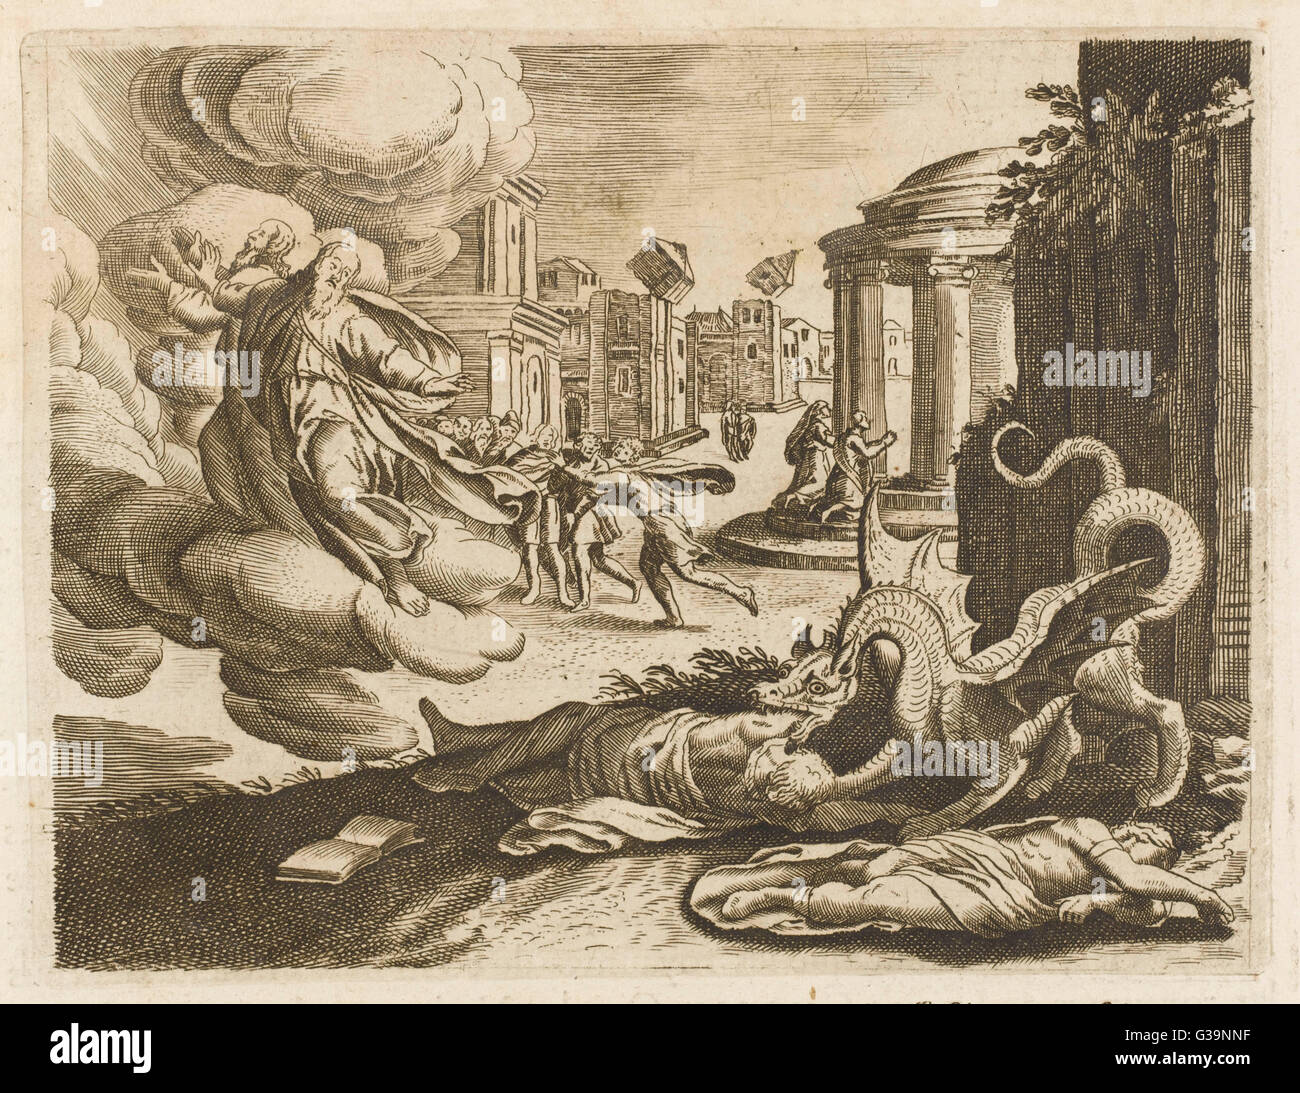 The dragon of the Apocalypse - Stock Image